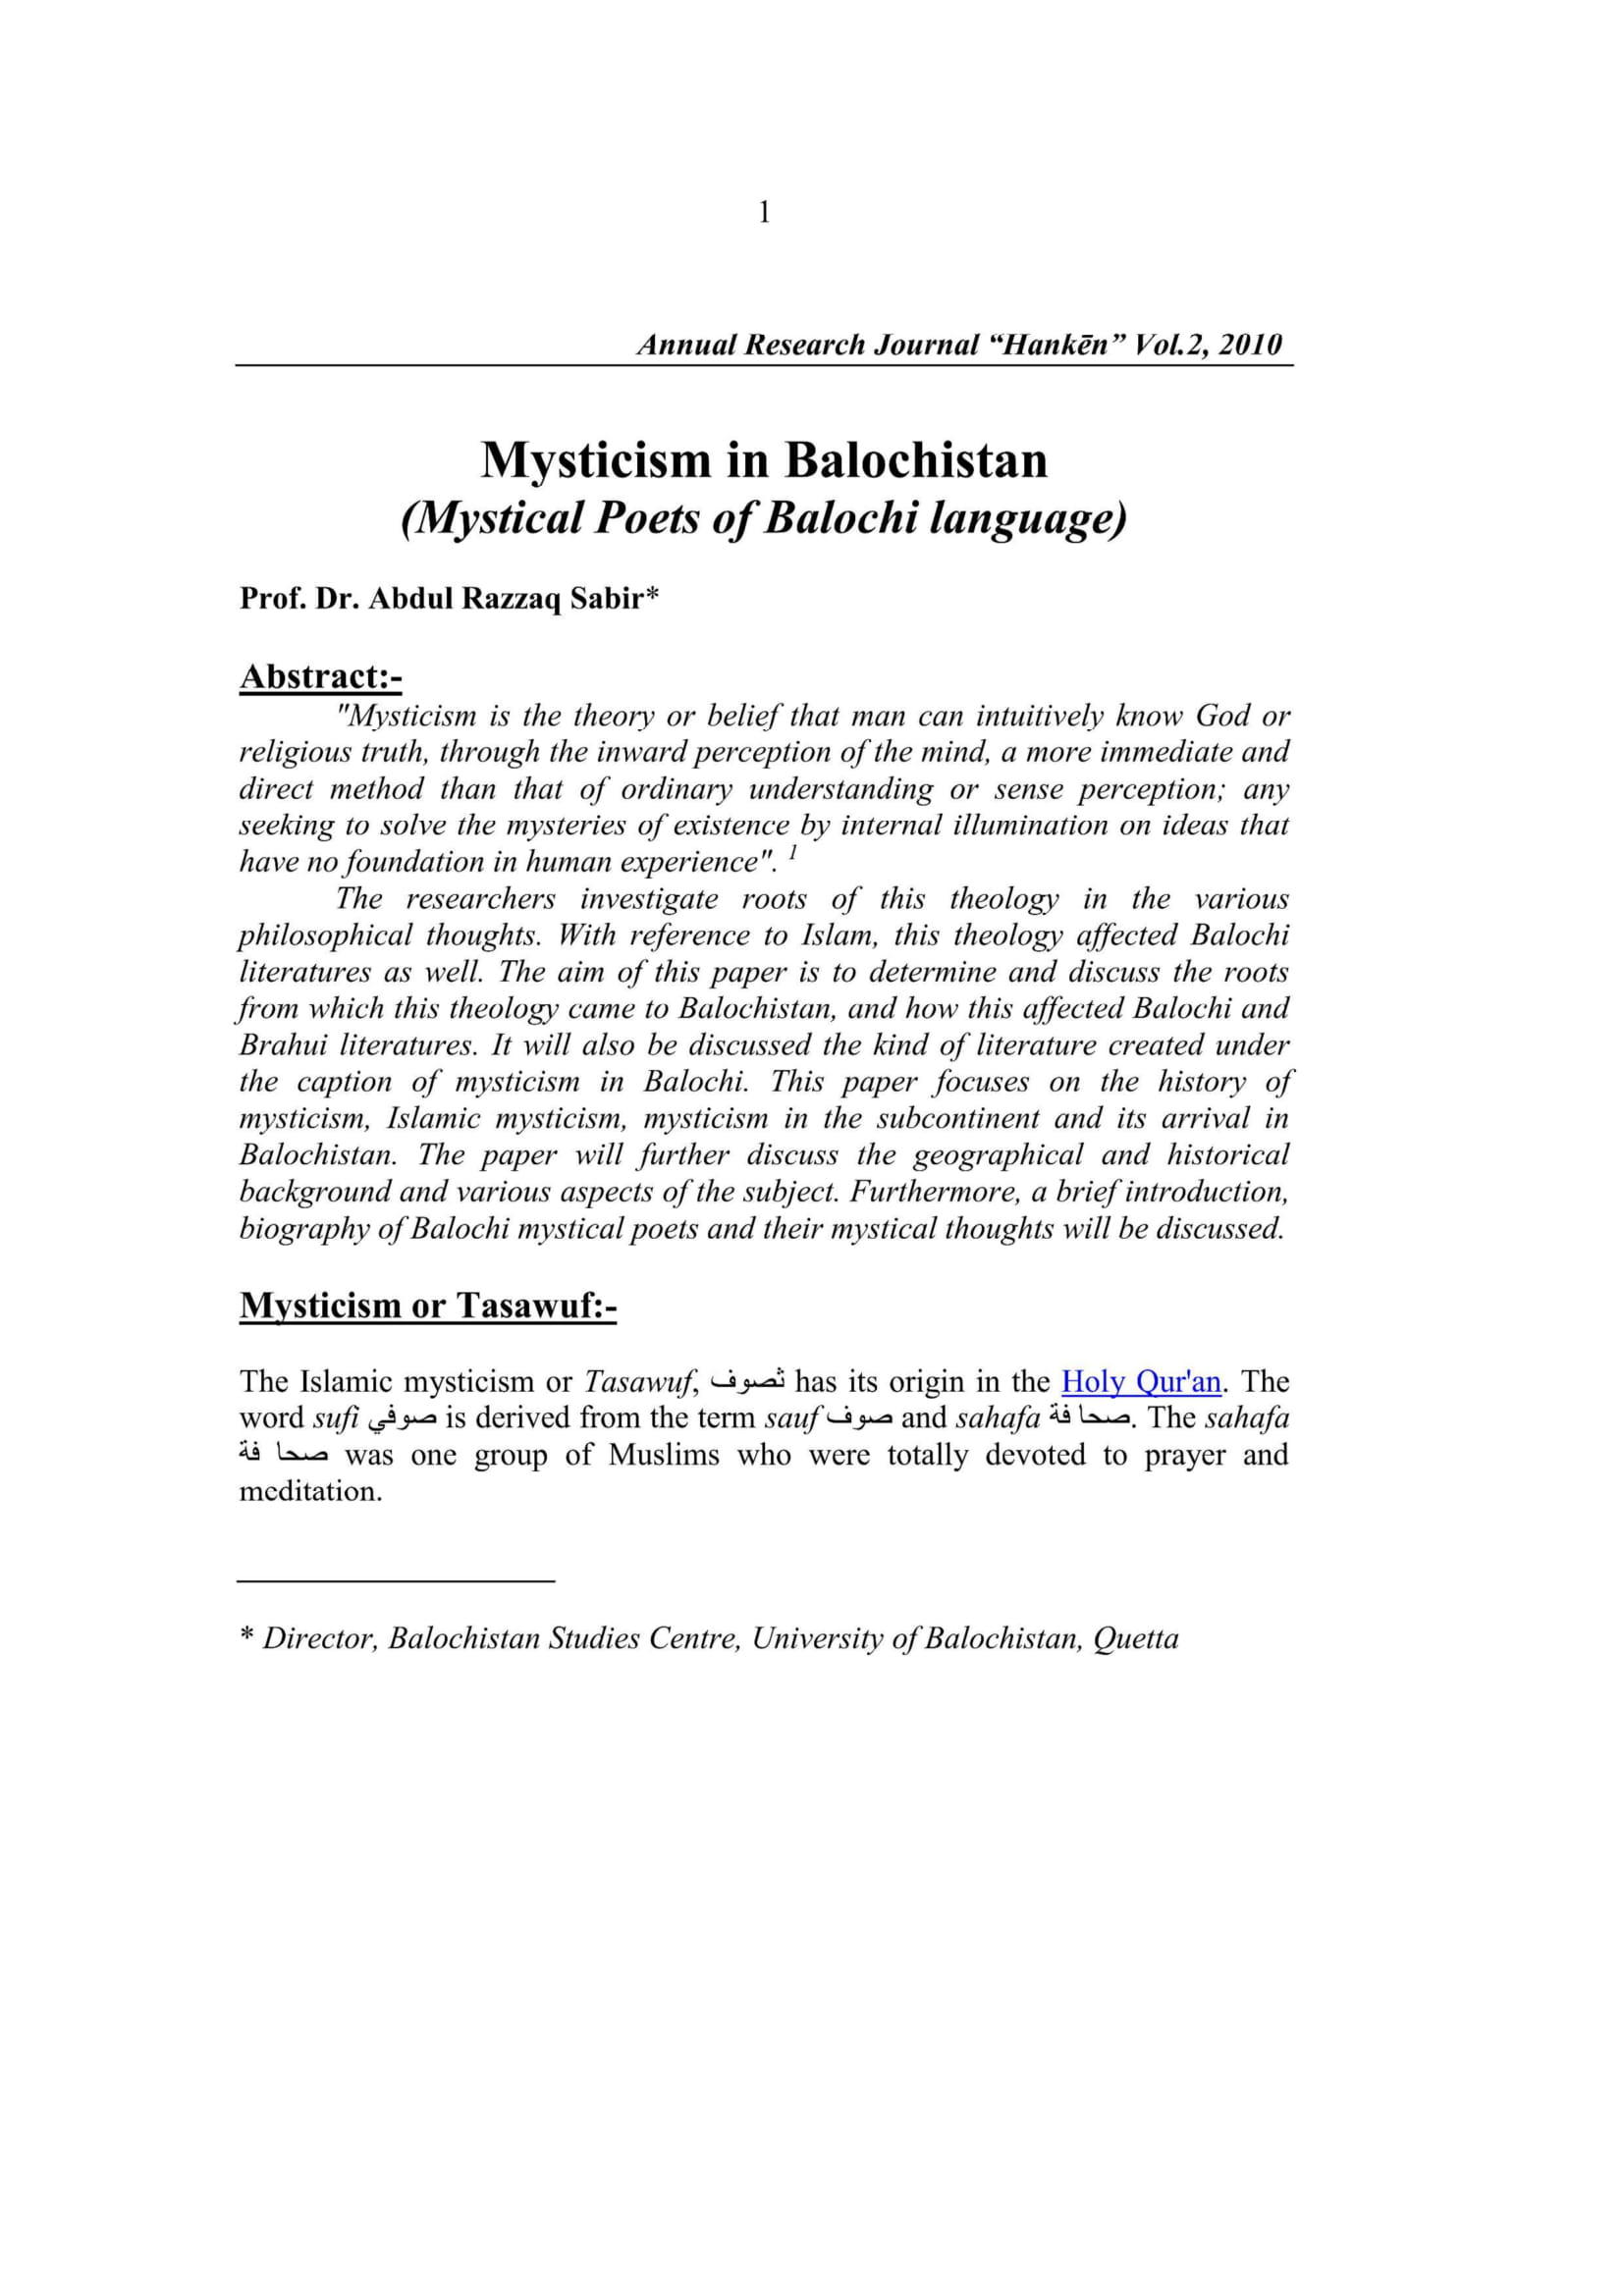 Mysticism in Balochistan (Mystical Poets of Balochi language)